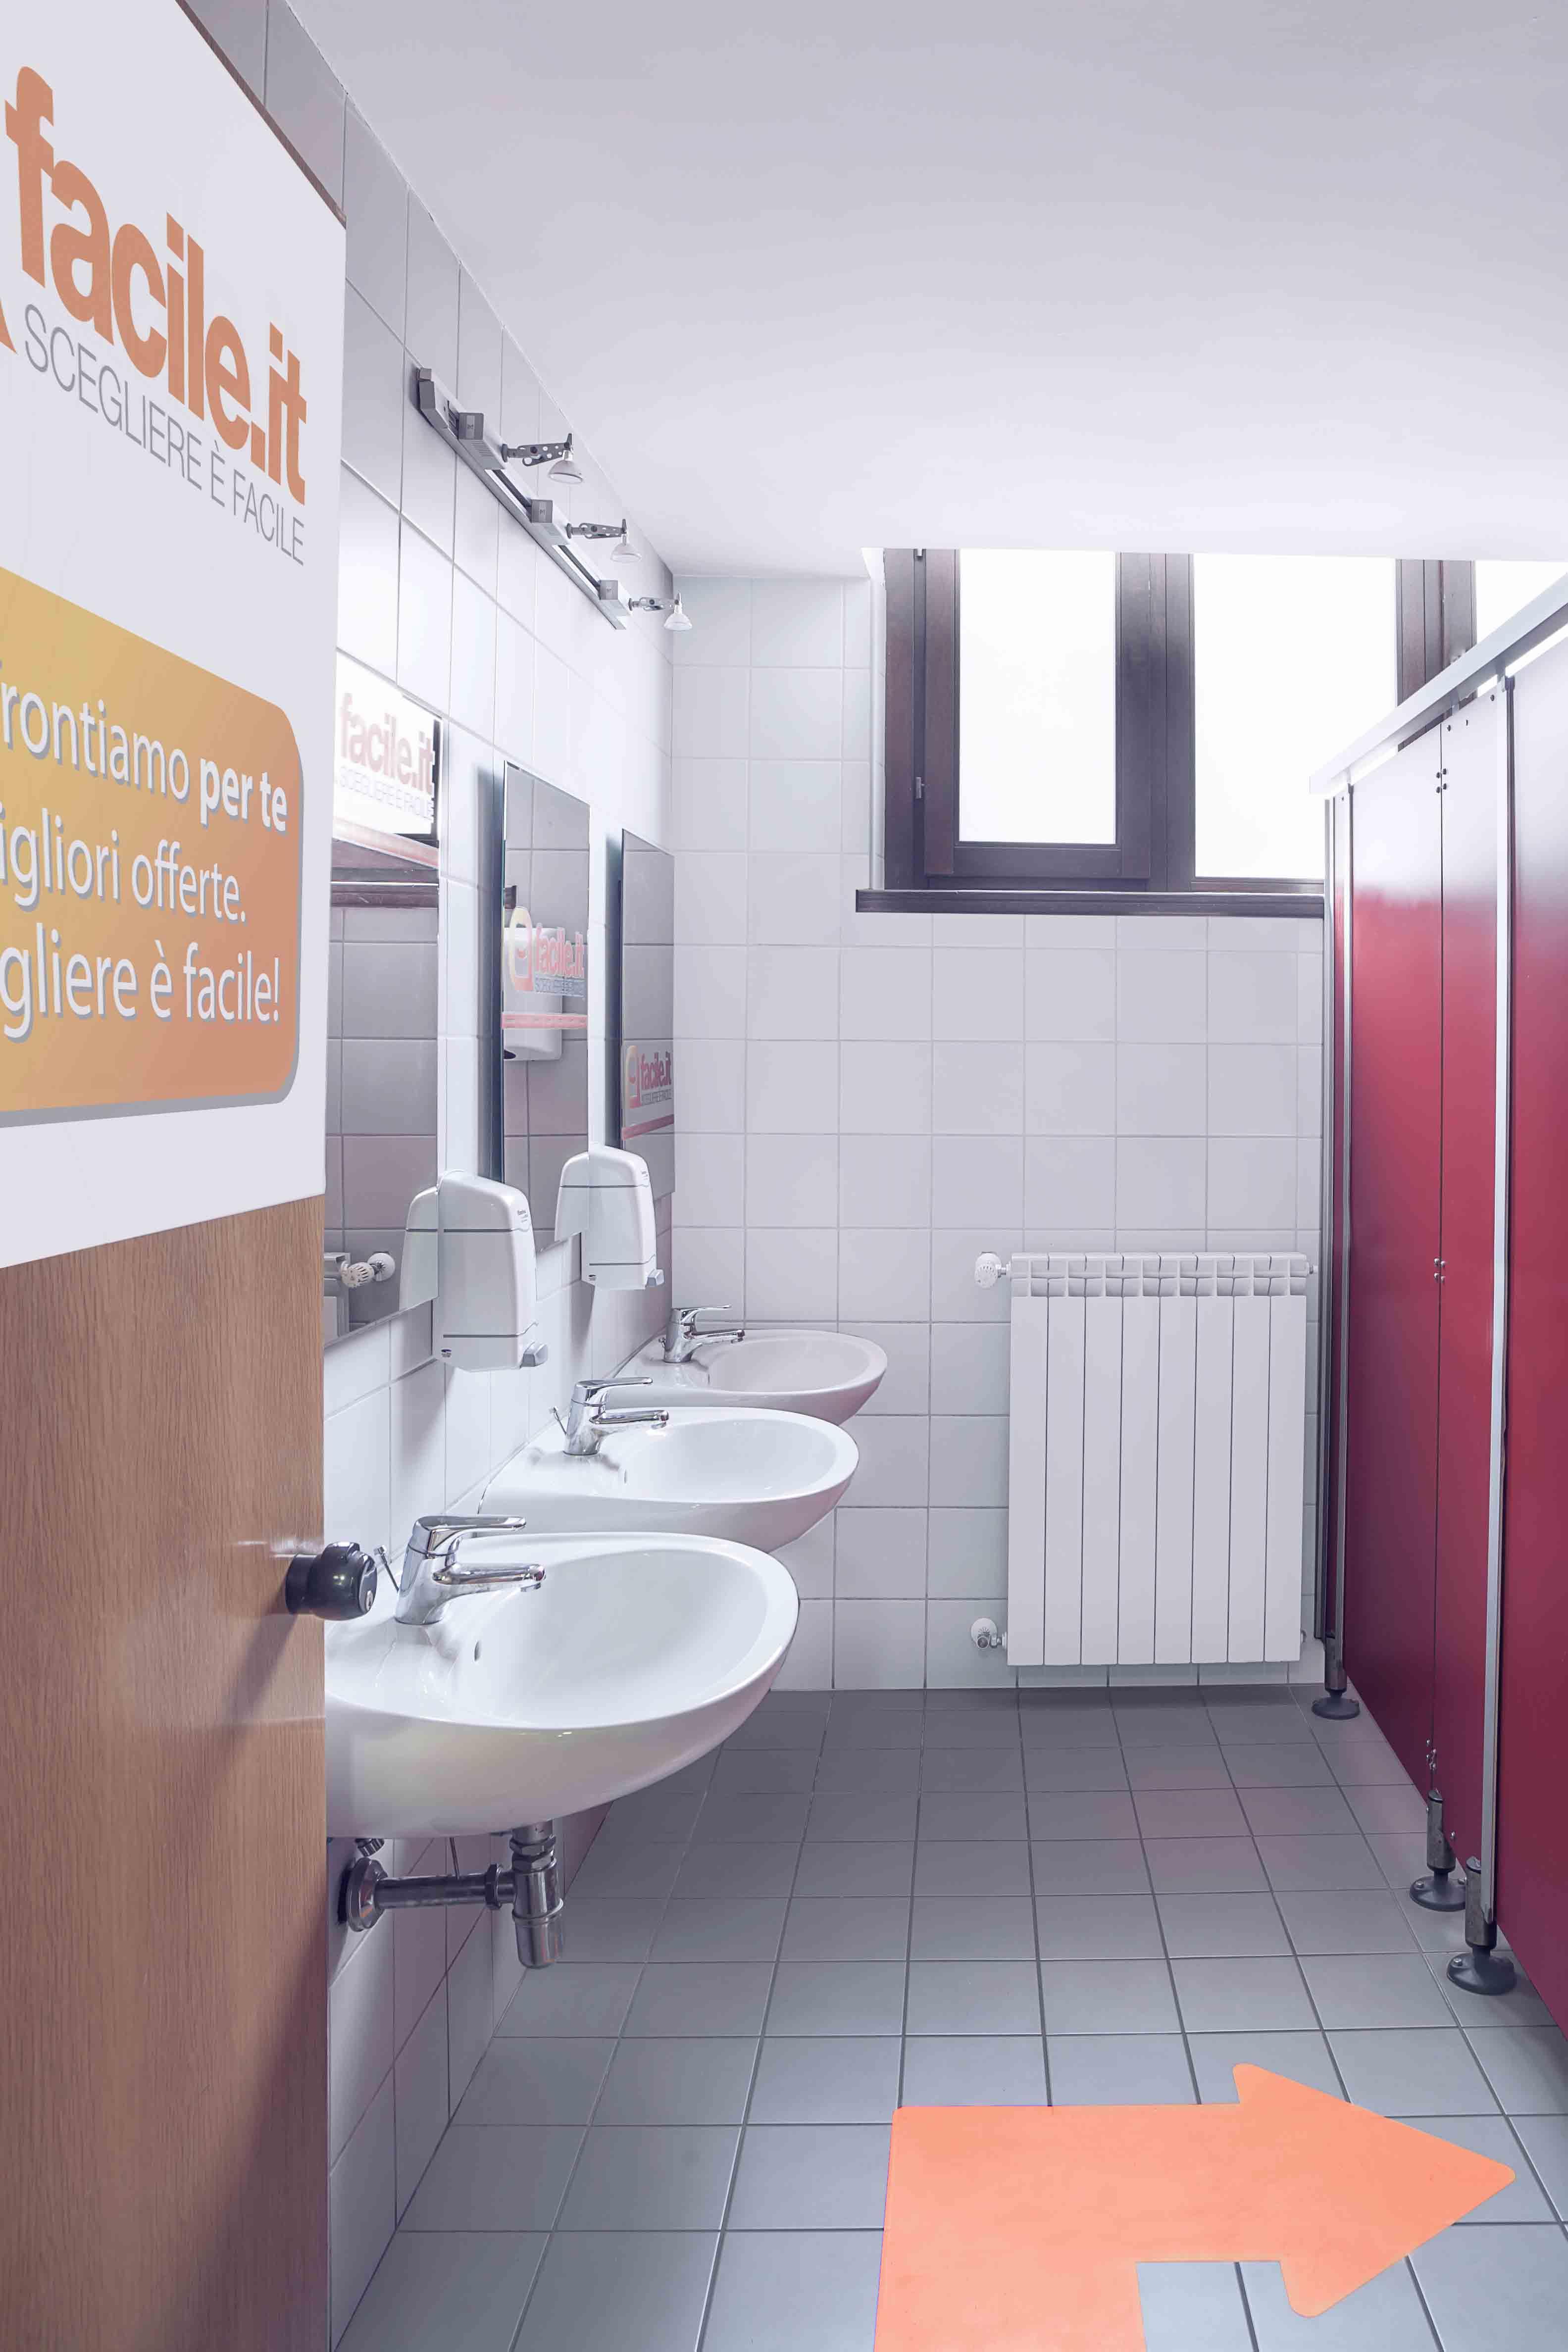 Bathroom Facile.it